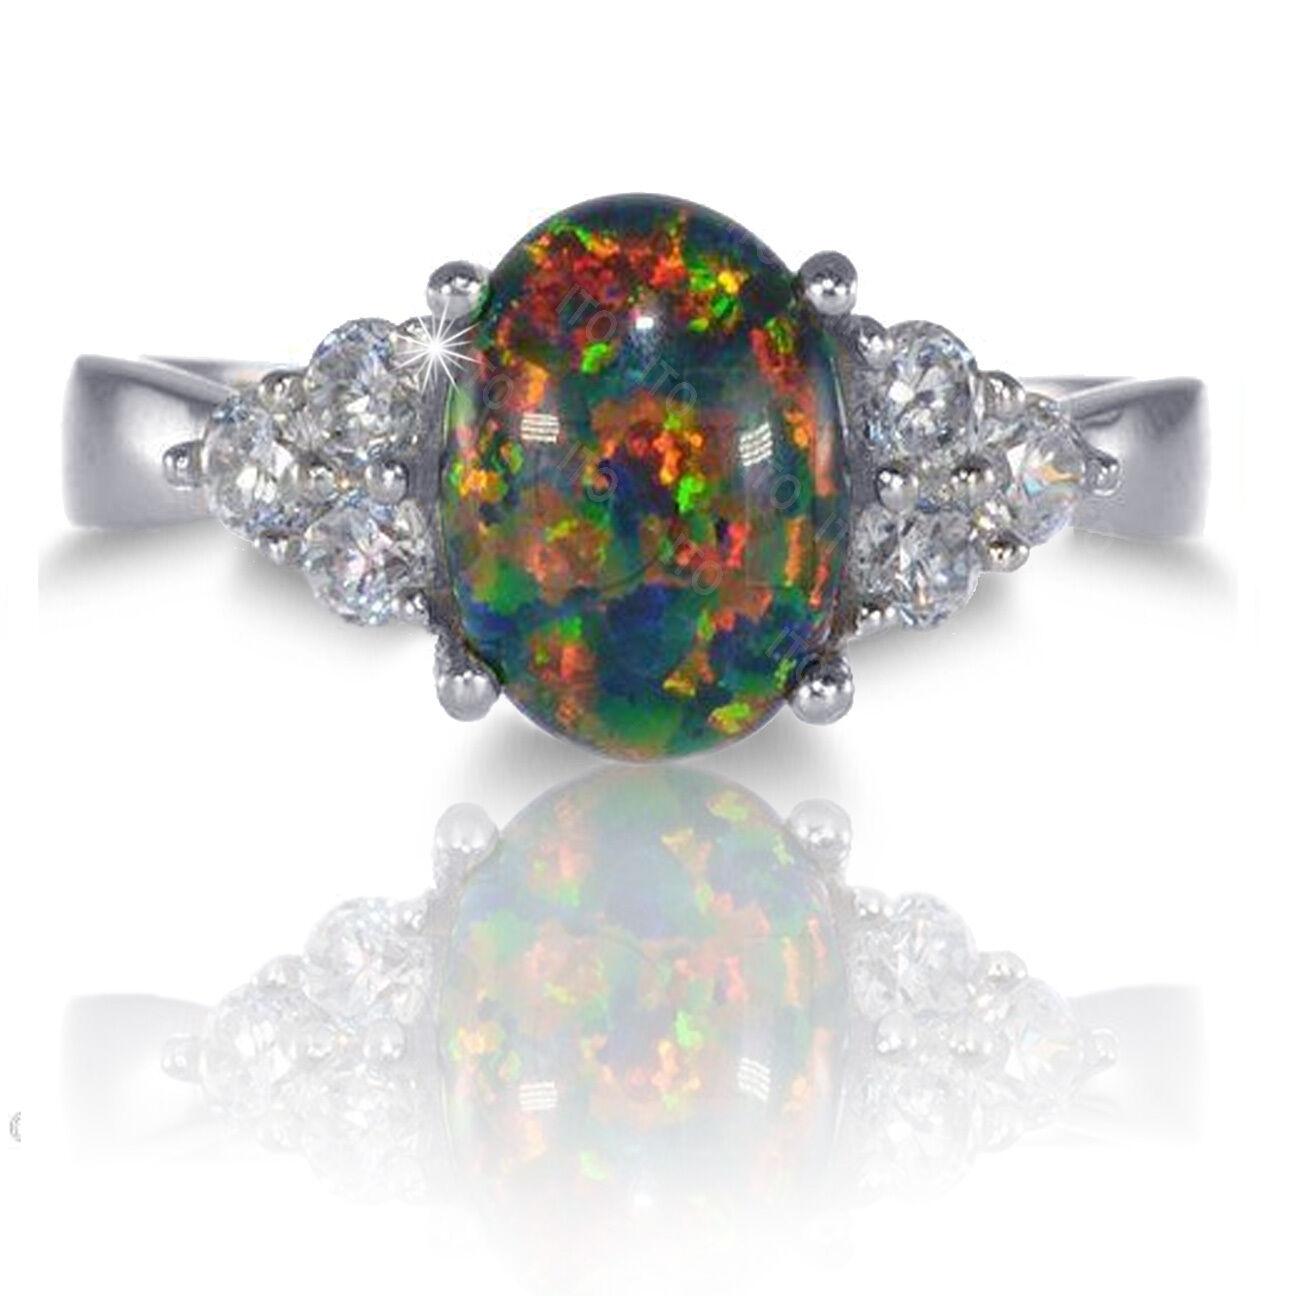 OTI Oval Australian Black Fire Opal Simulated Diamonds Ge...